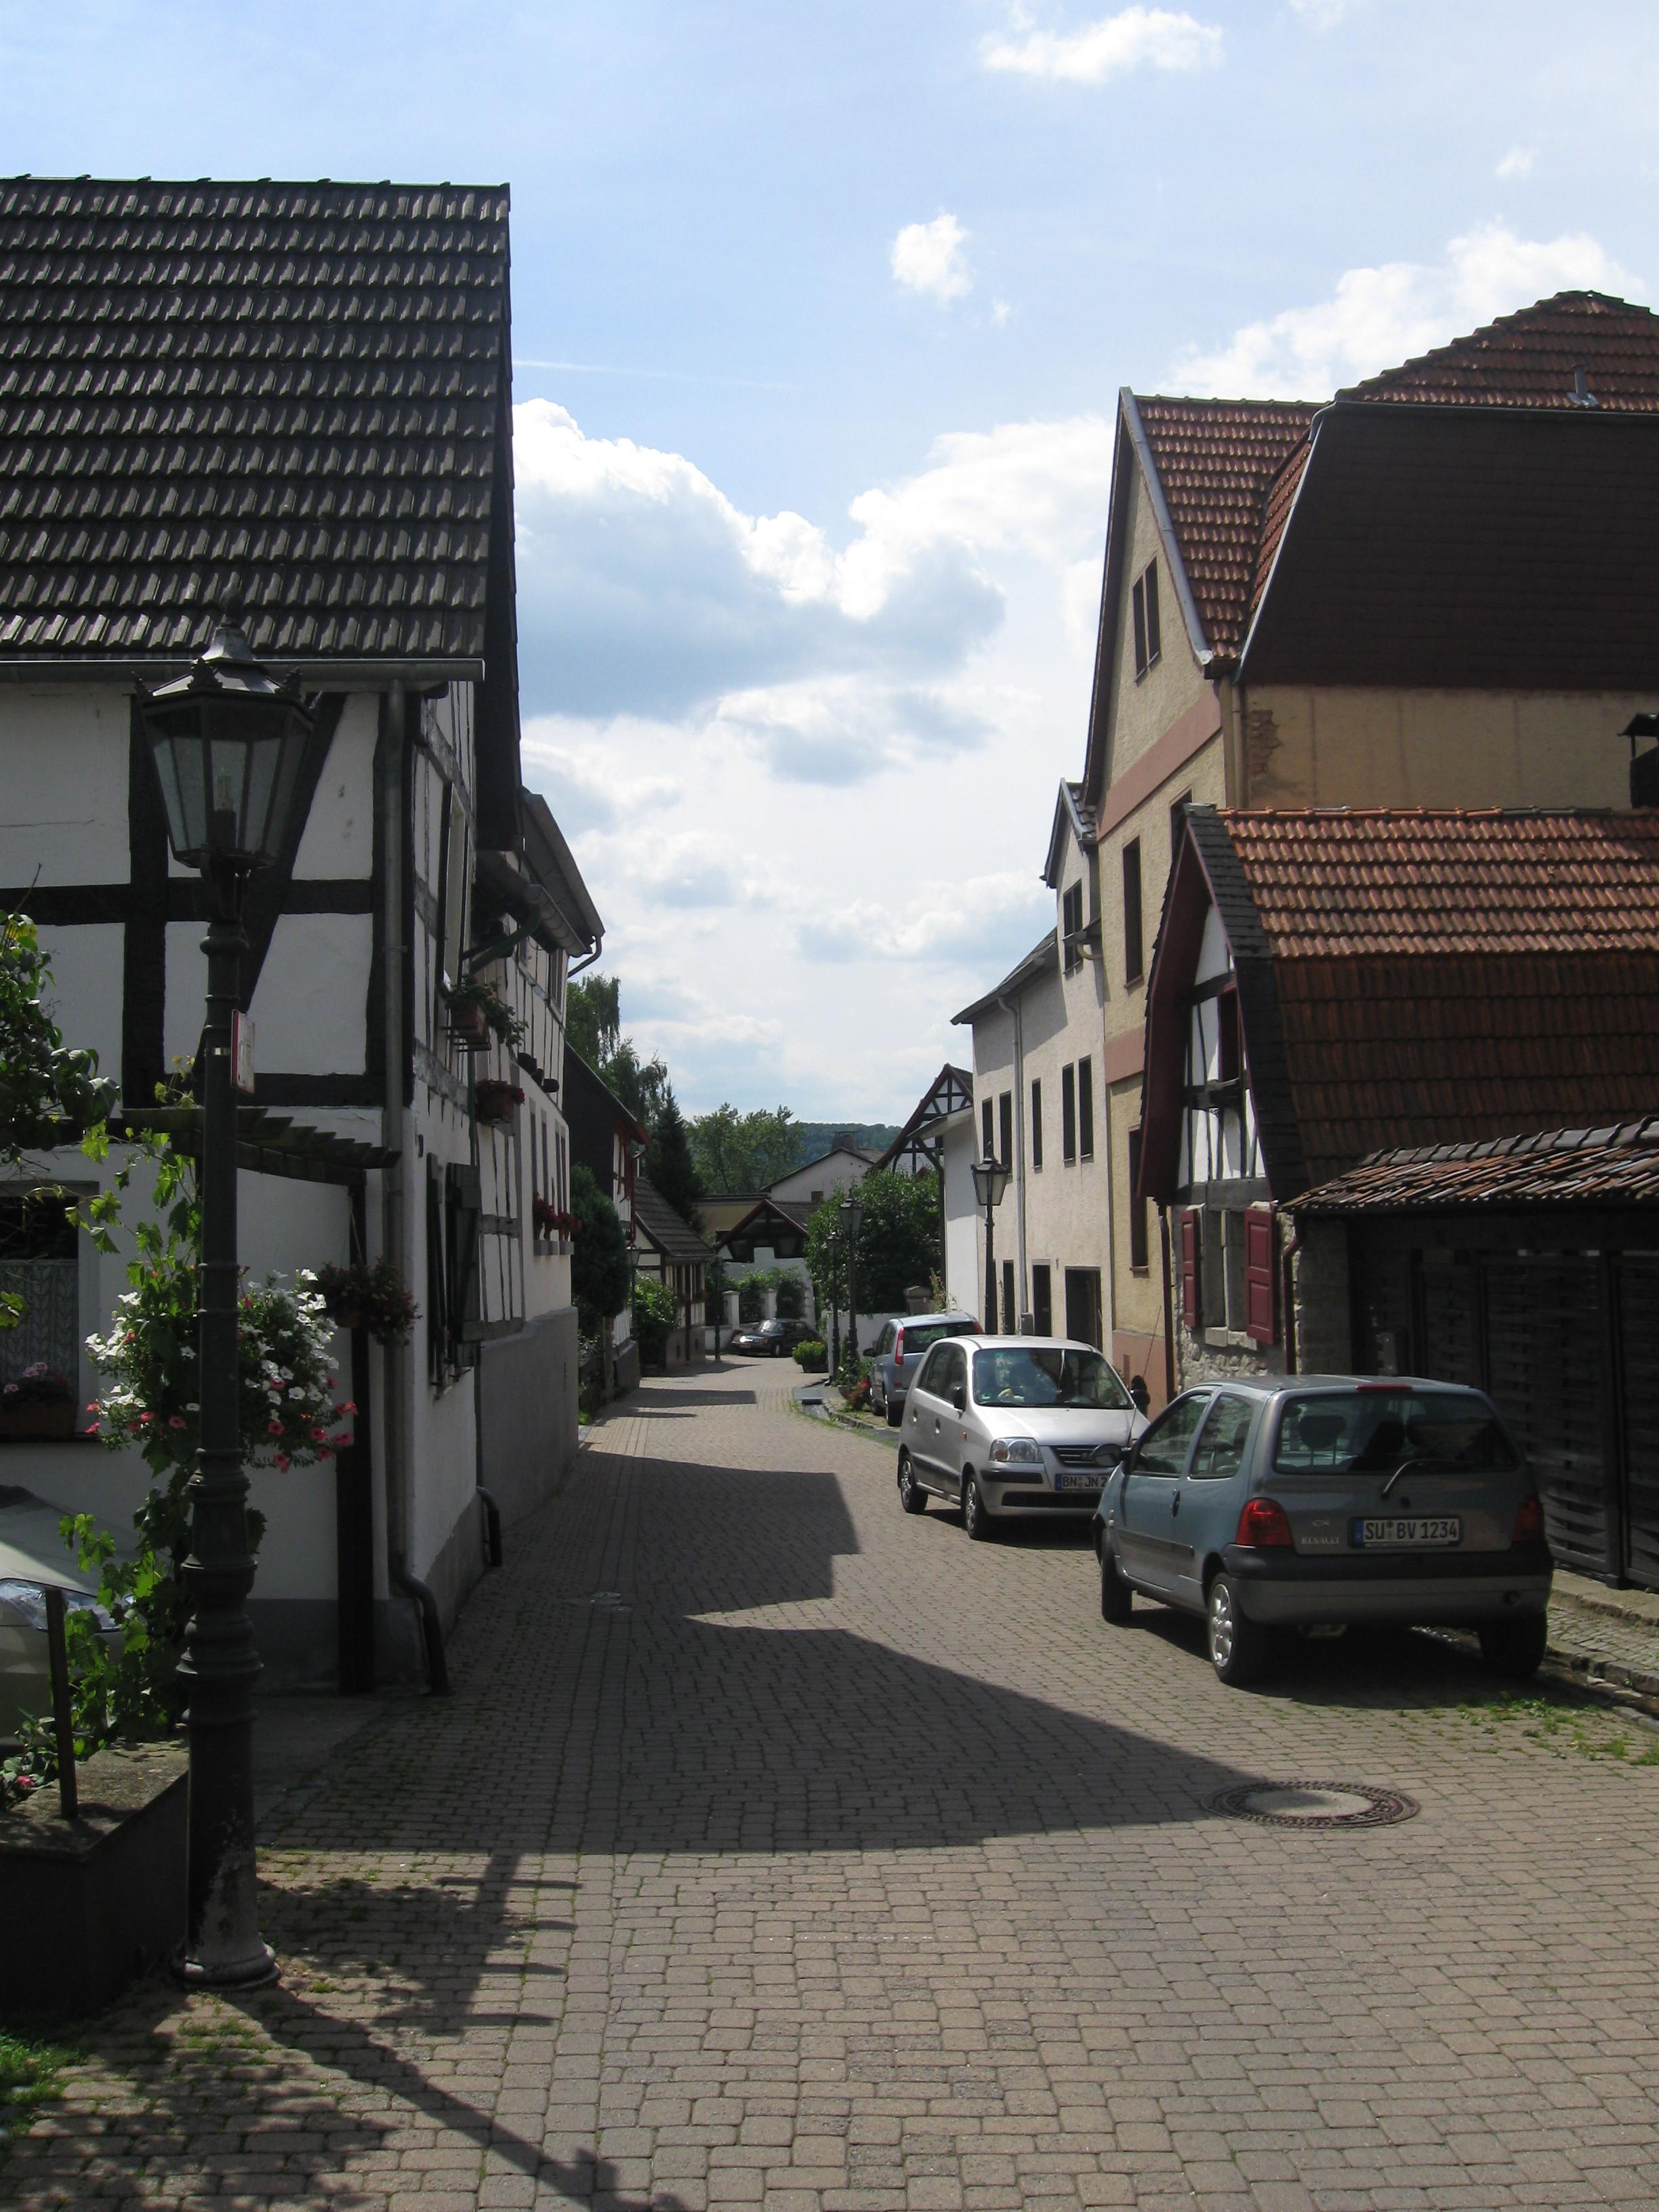 rhndorf0389lkvc.jpg